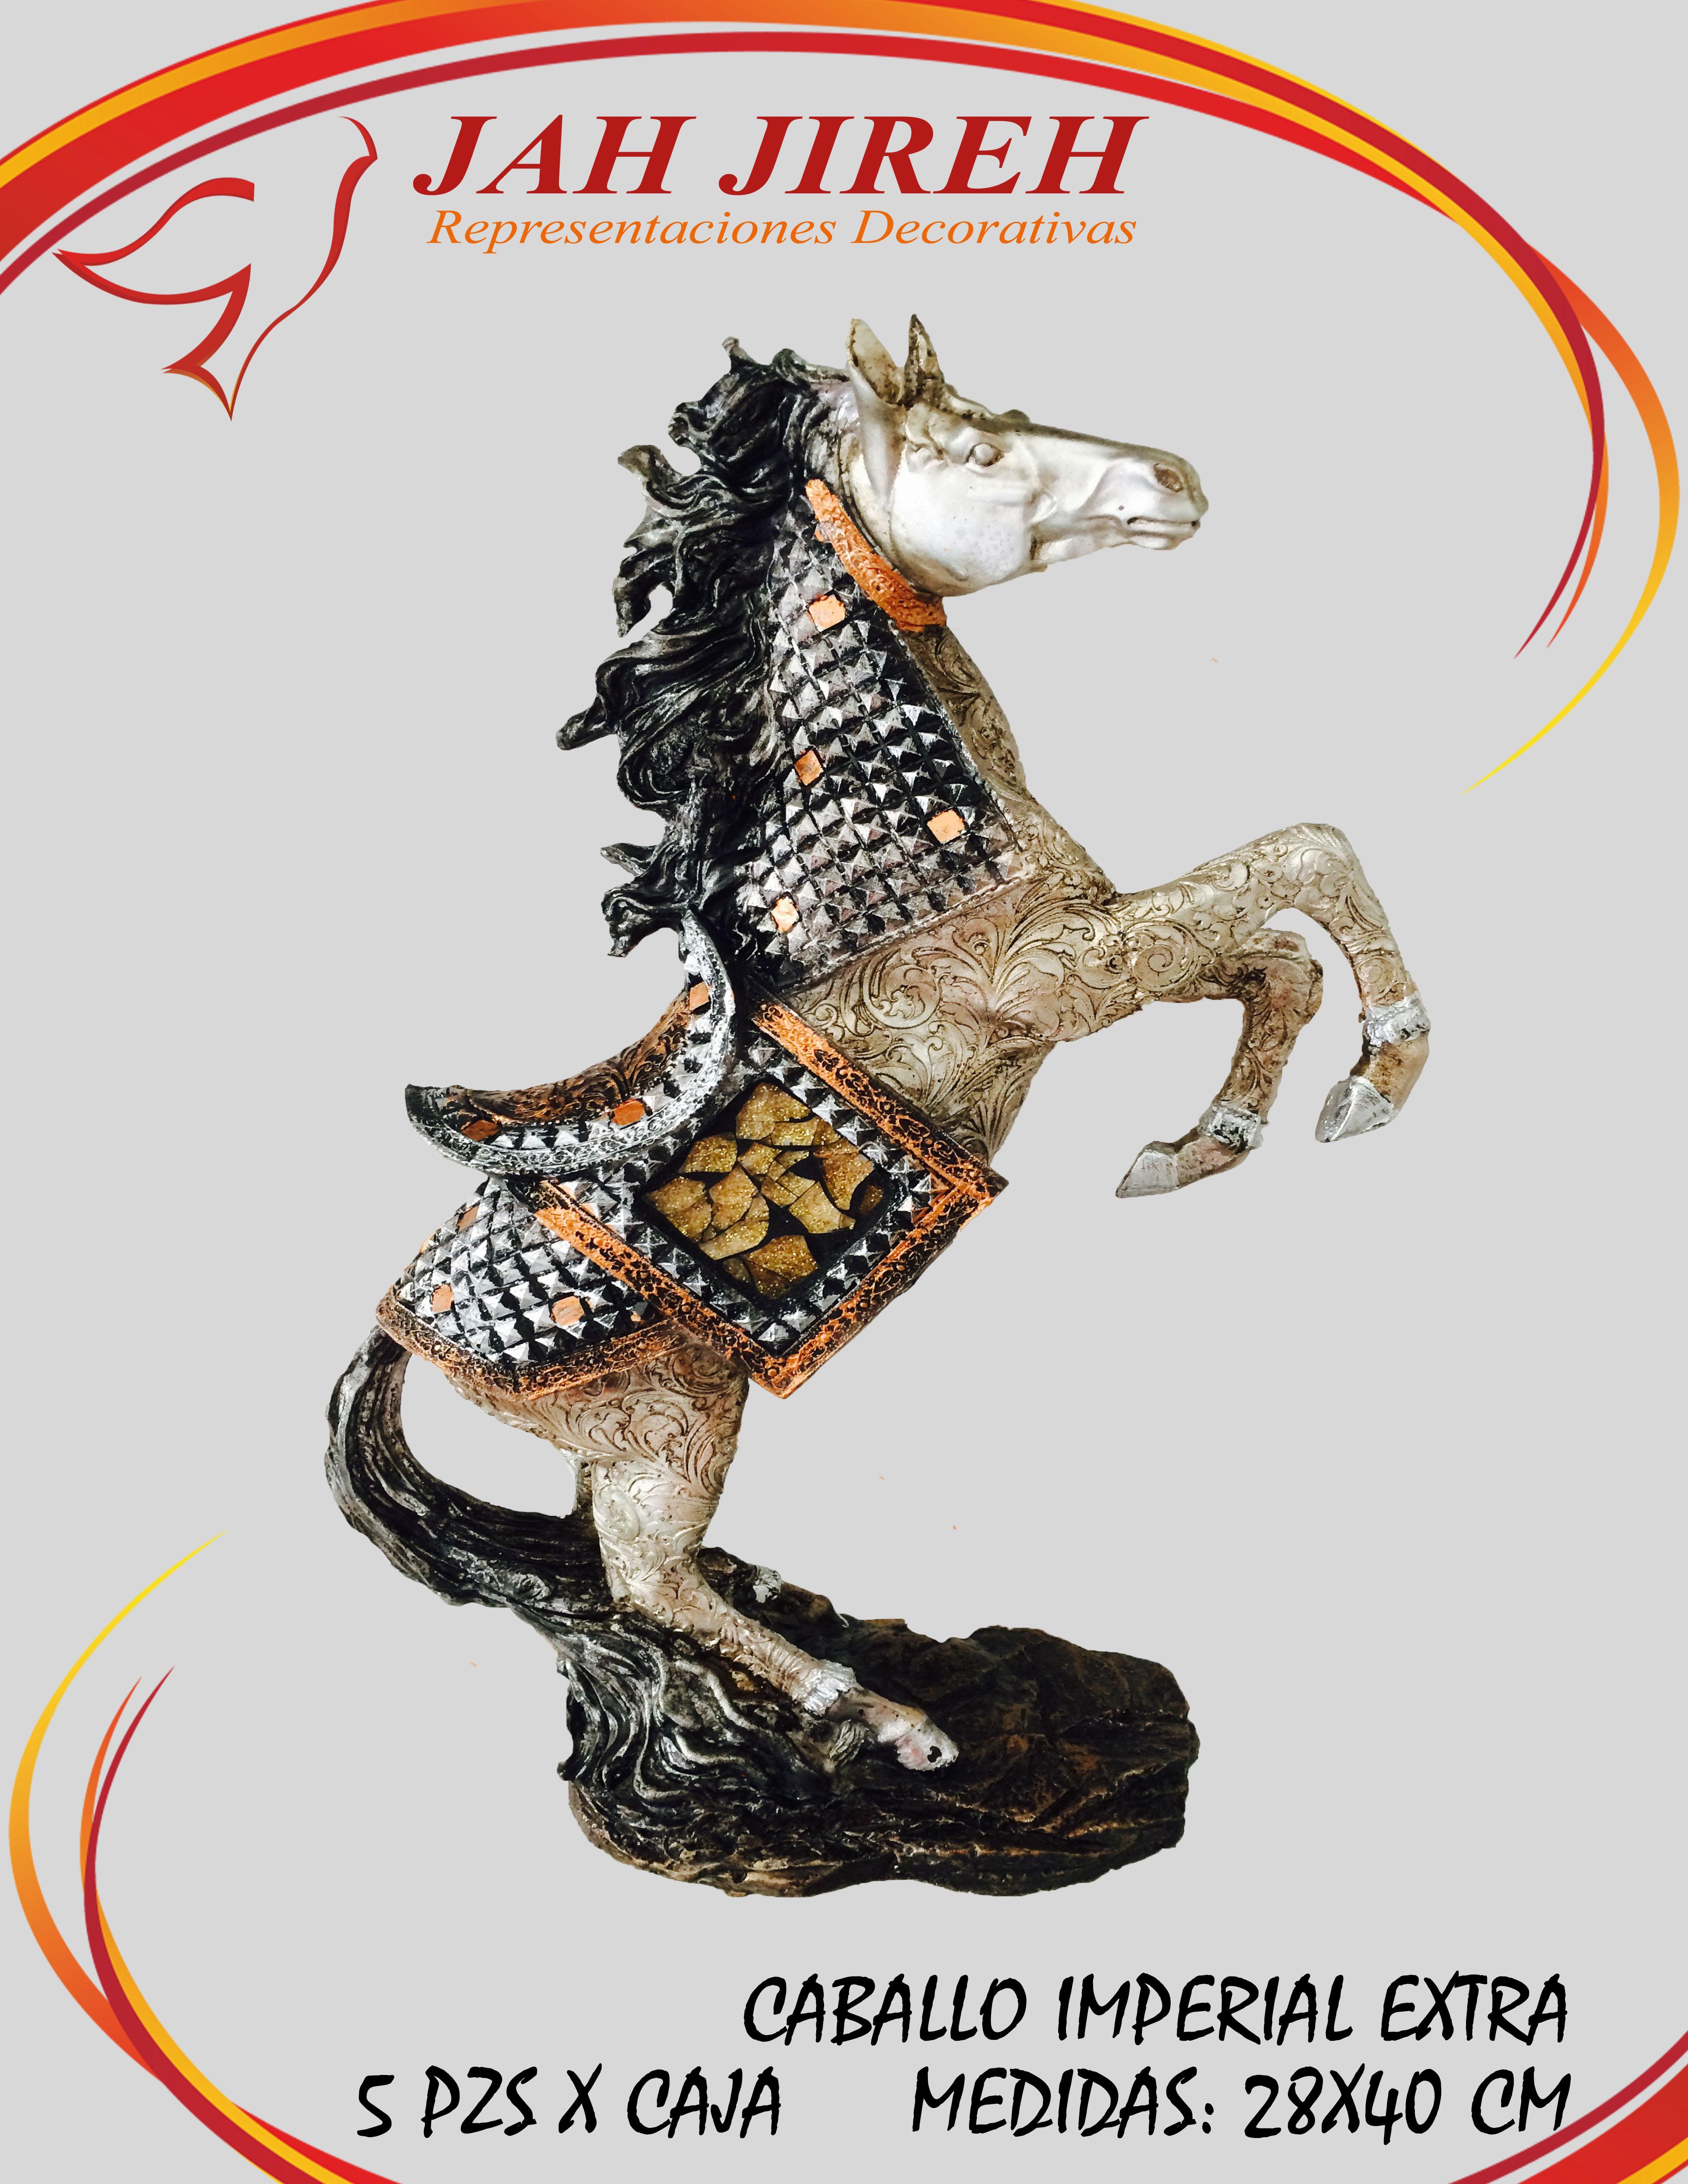 https://0201.nccdn.net/1_2/000/000/0c5/2e3/caballo-imperial-extra.jpg